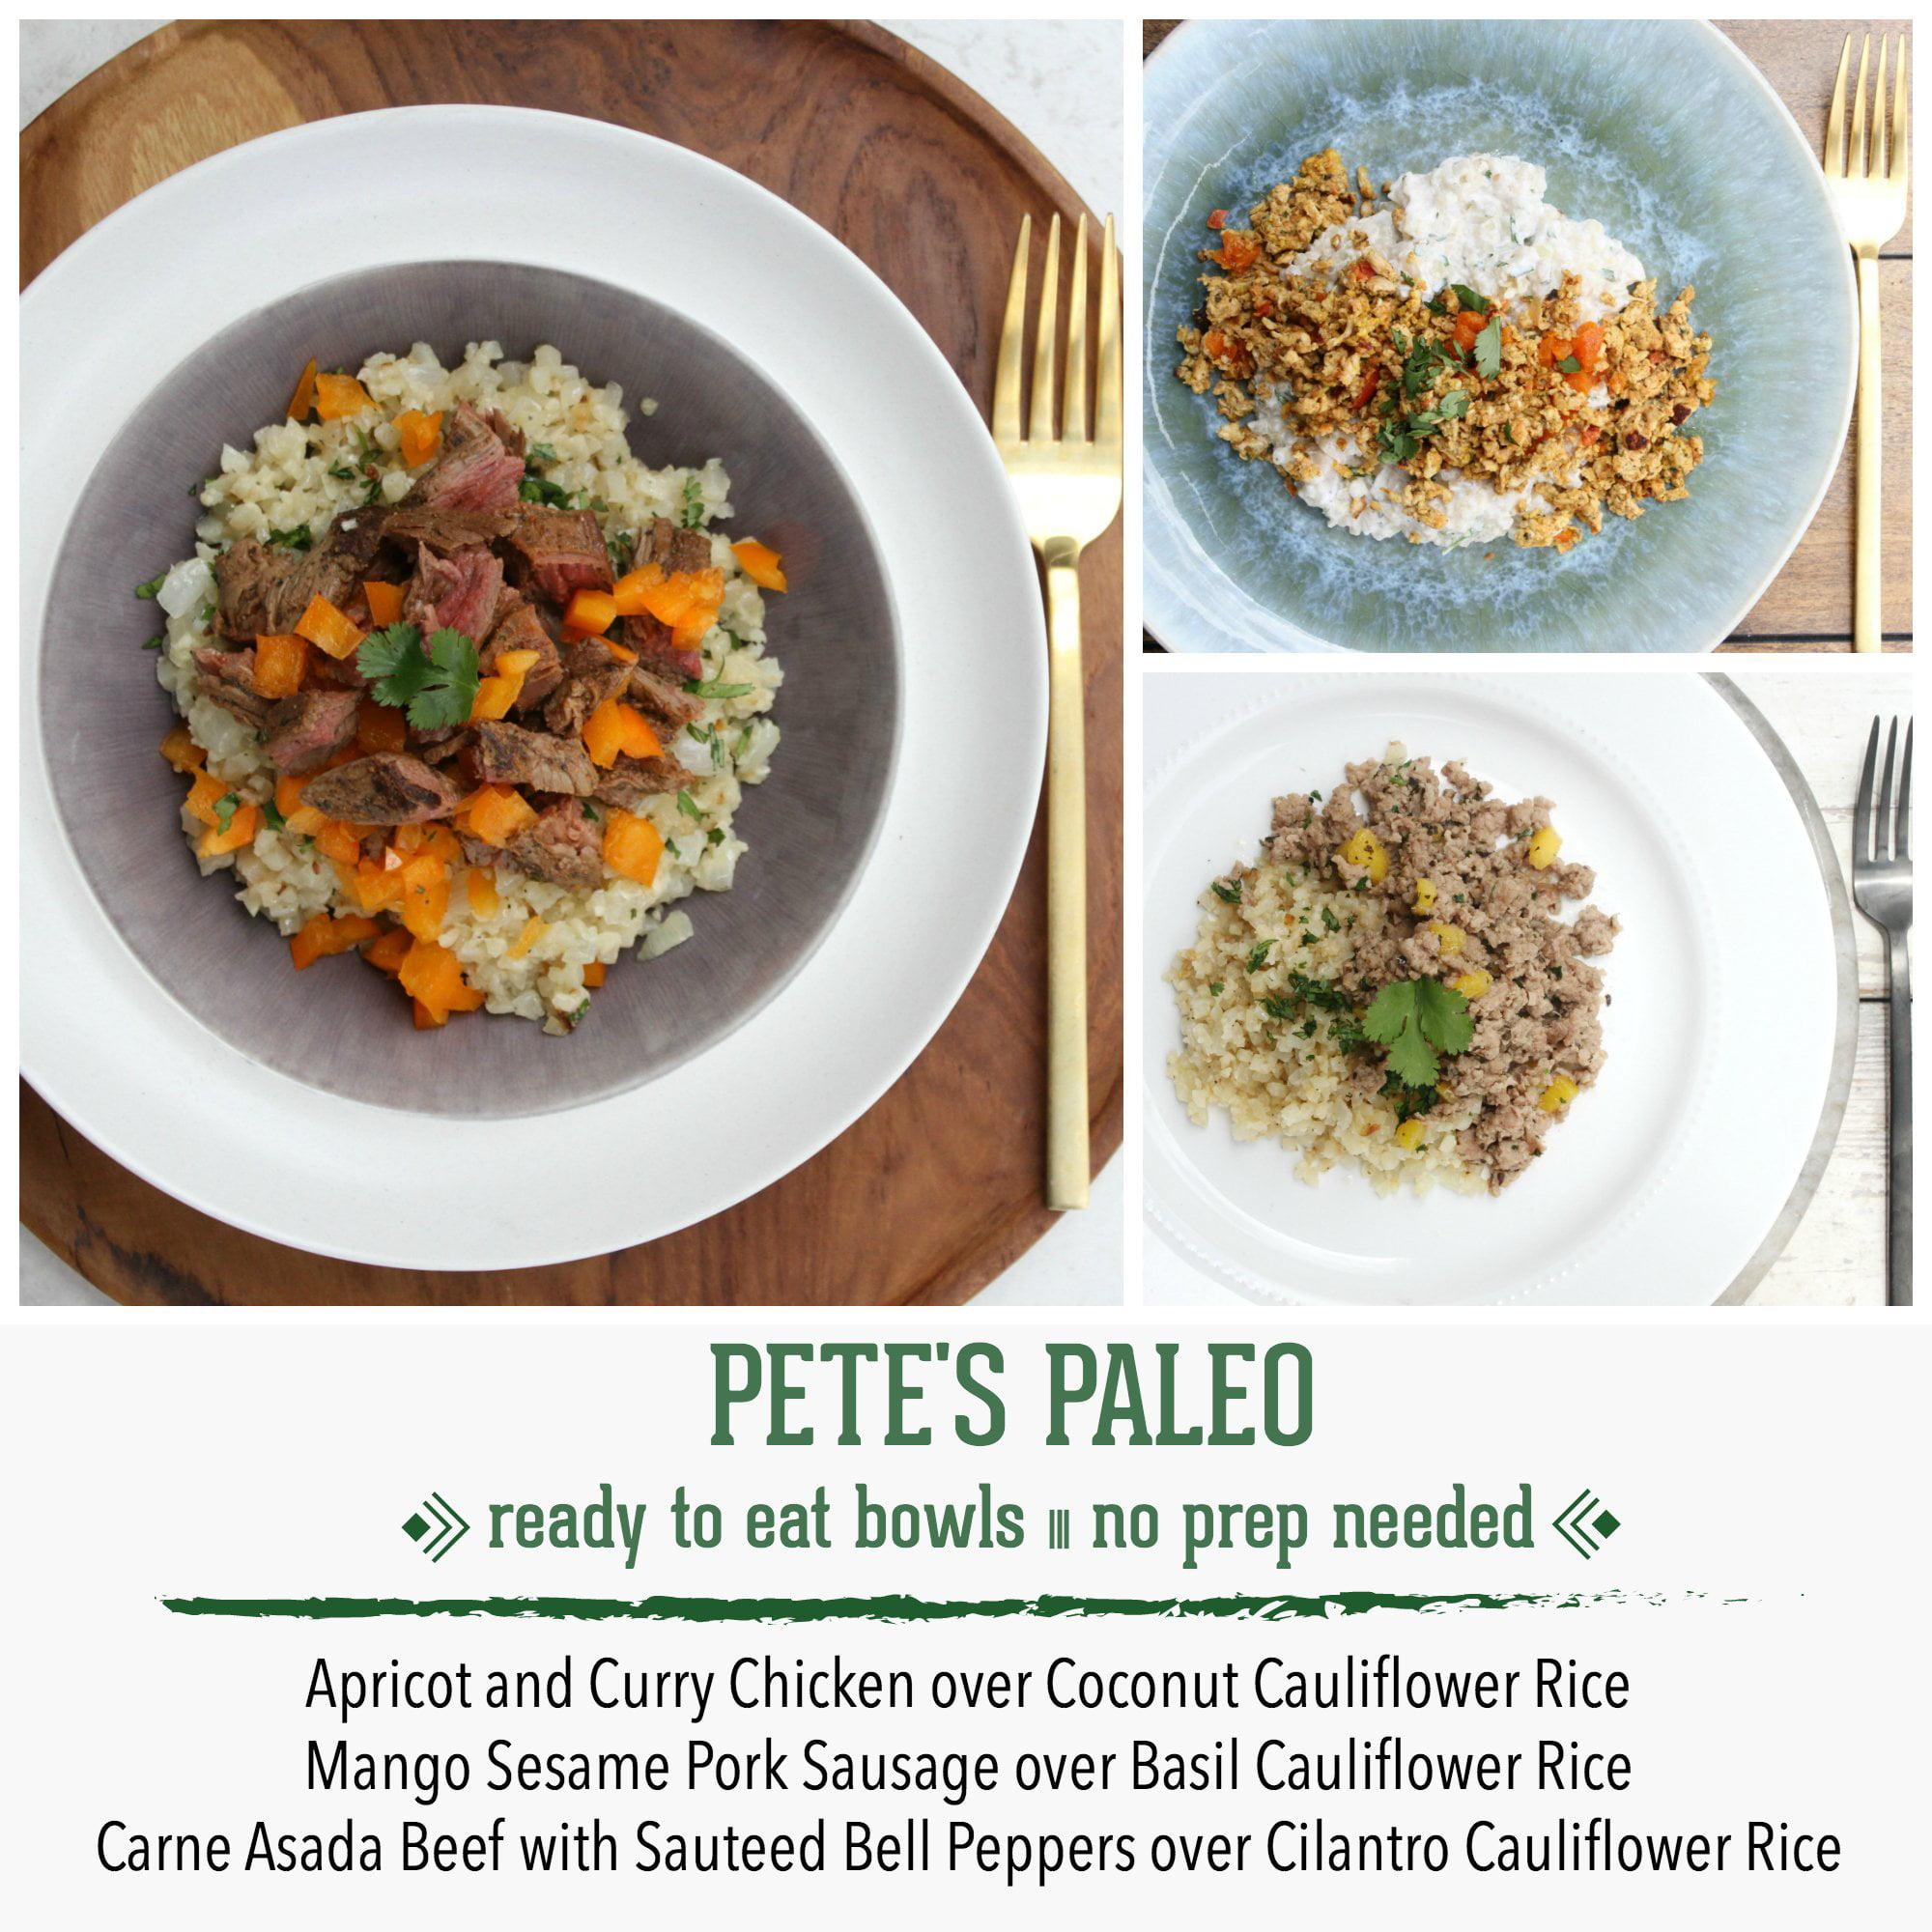 Pete's Paleo No Prep Organic Cauliflower Rice Bowls, Bundle of 3